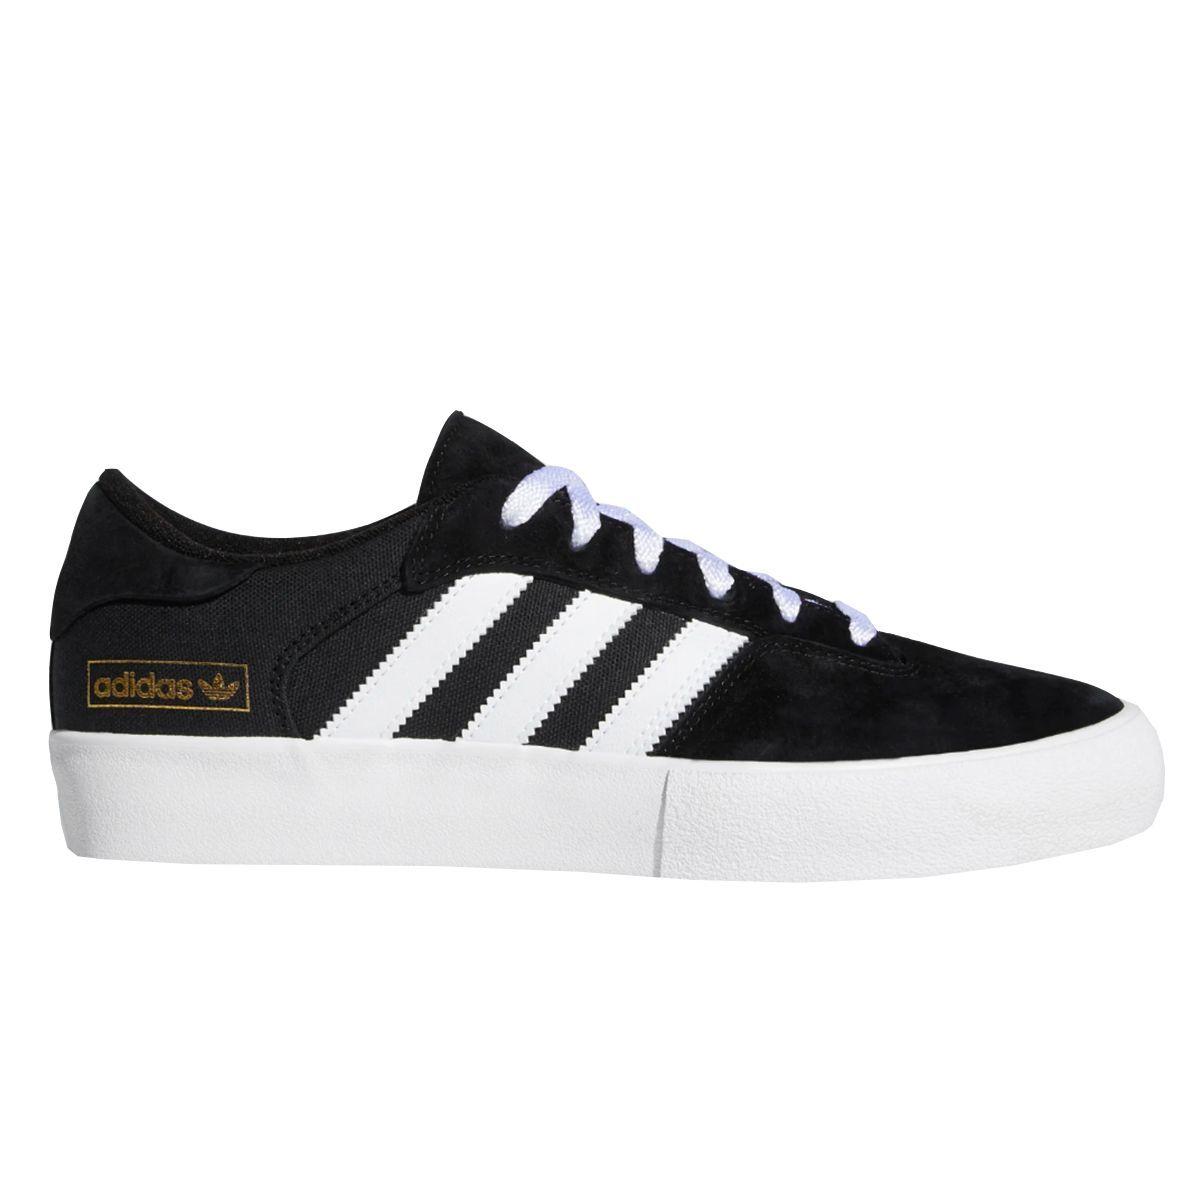 "ADIDAS ""Matchbreak Super"" skate shoes"